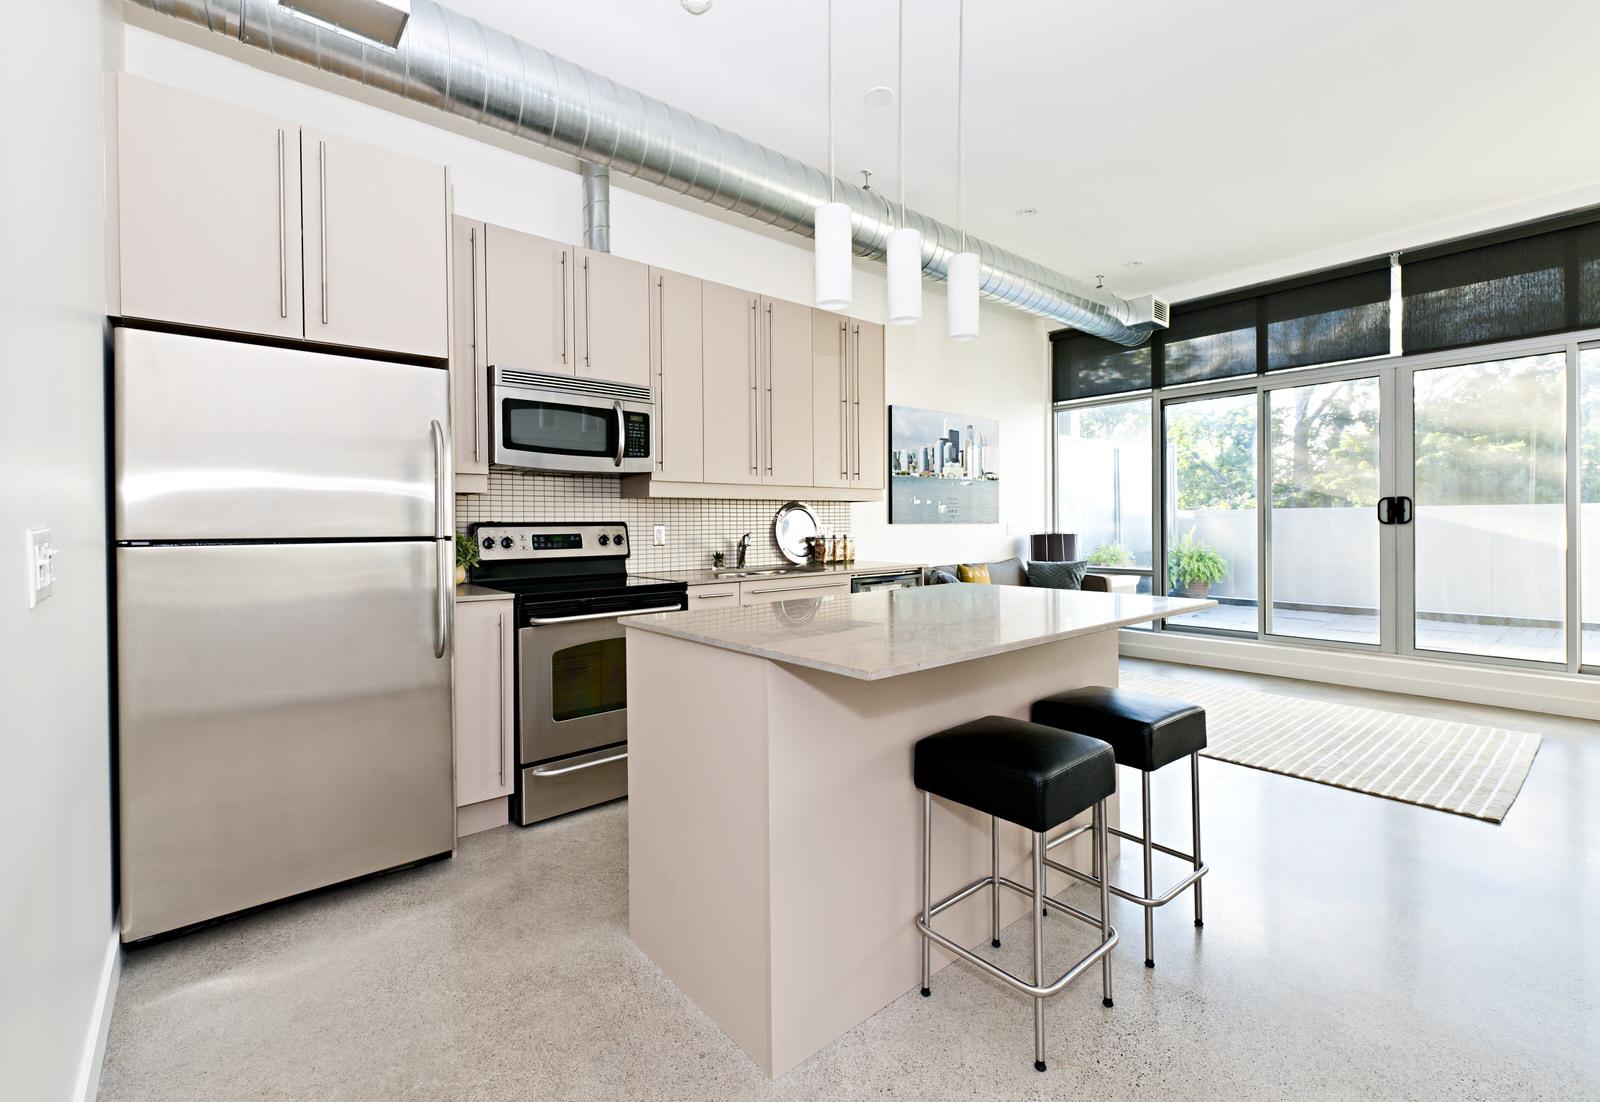 bigstock-Kitchen-and-living-room-of-lof-62070140.jpg